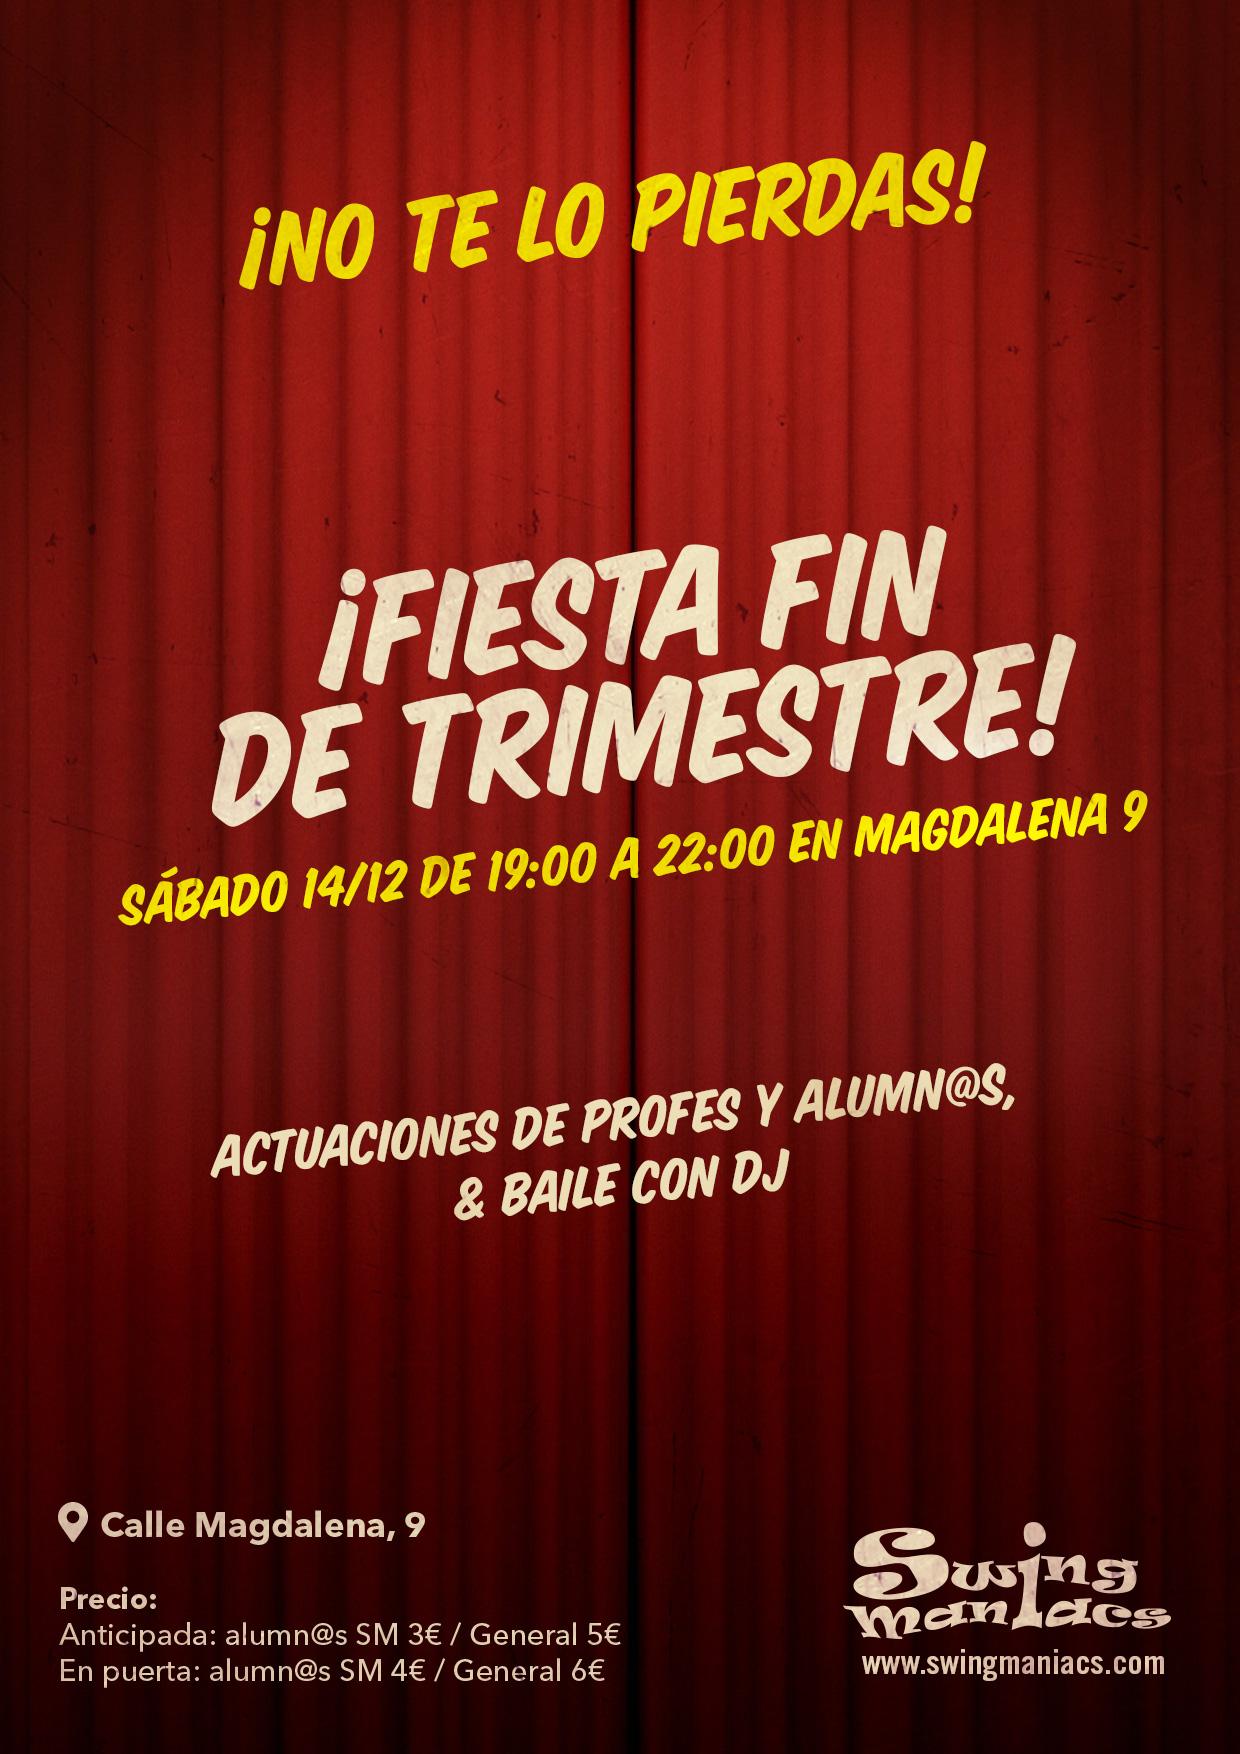 ¡FIESTA FIN DE TRIMESTRE!